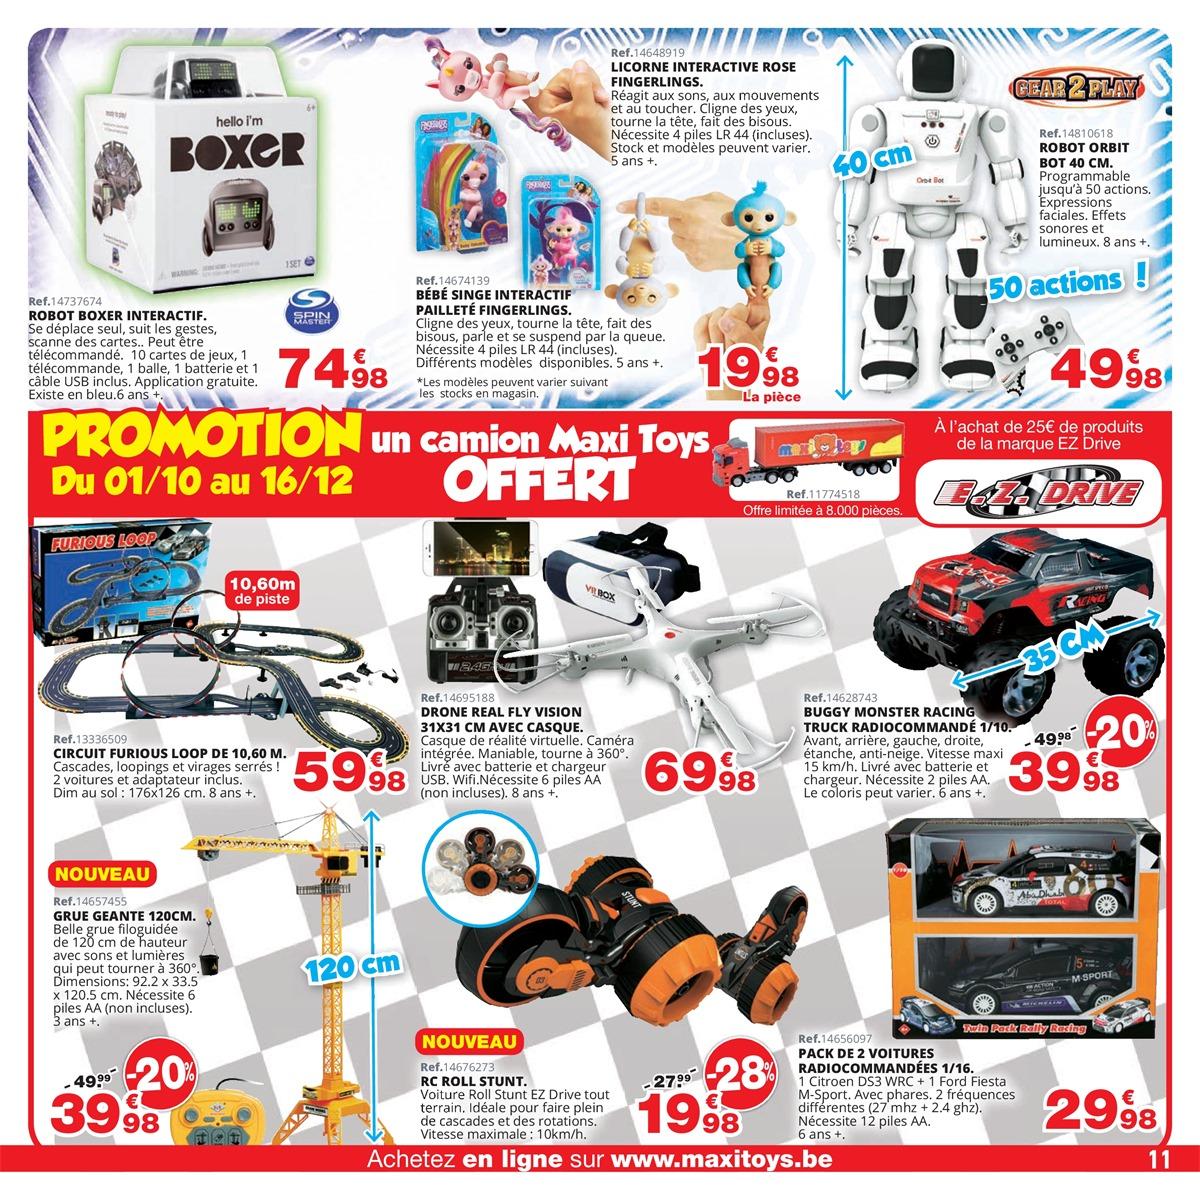 Maxi 26112018 Promotions Mois 16122018 Toys Au Folder Du WEHY9I2D